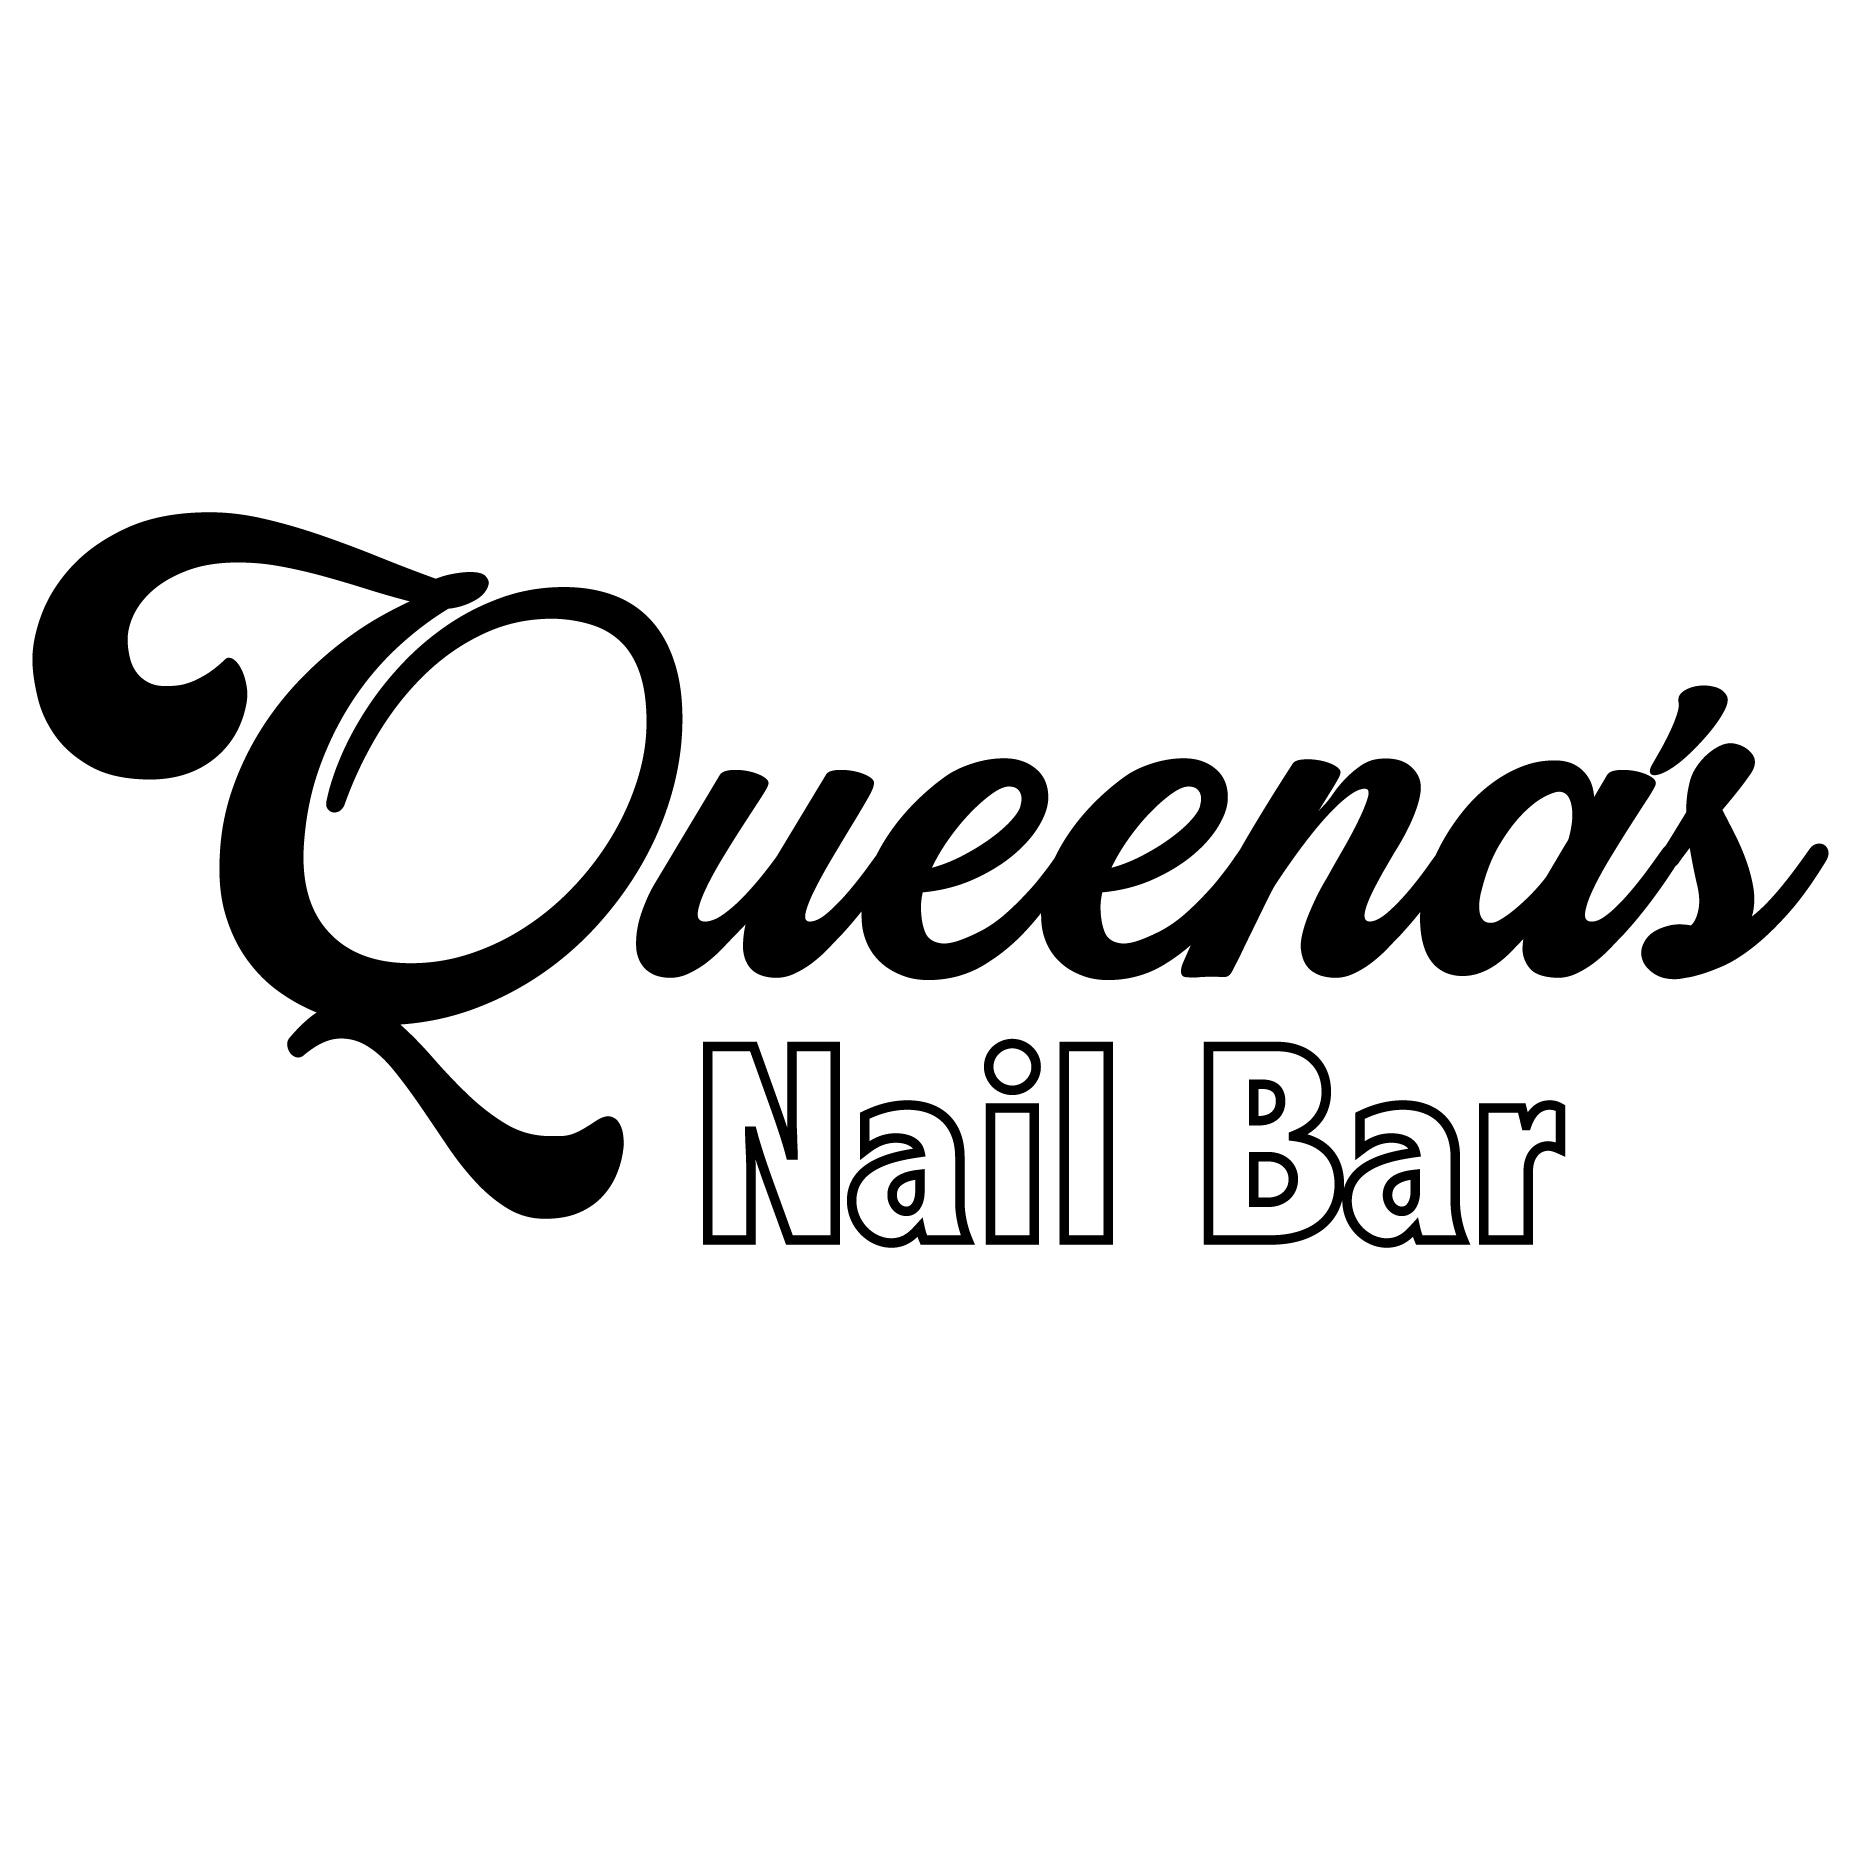 Queena's Nail Bar